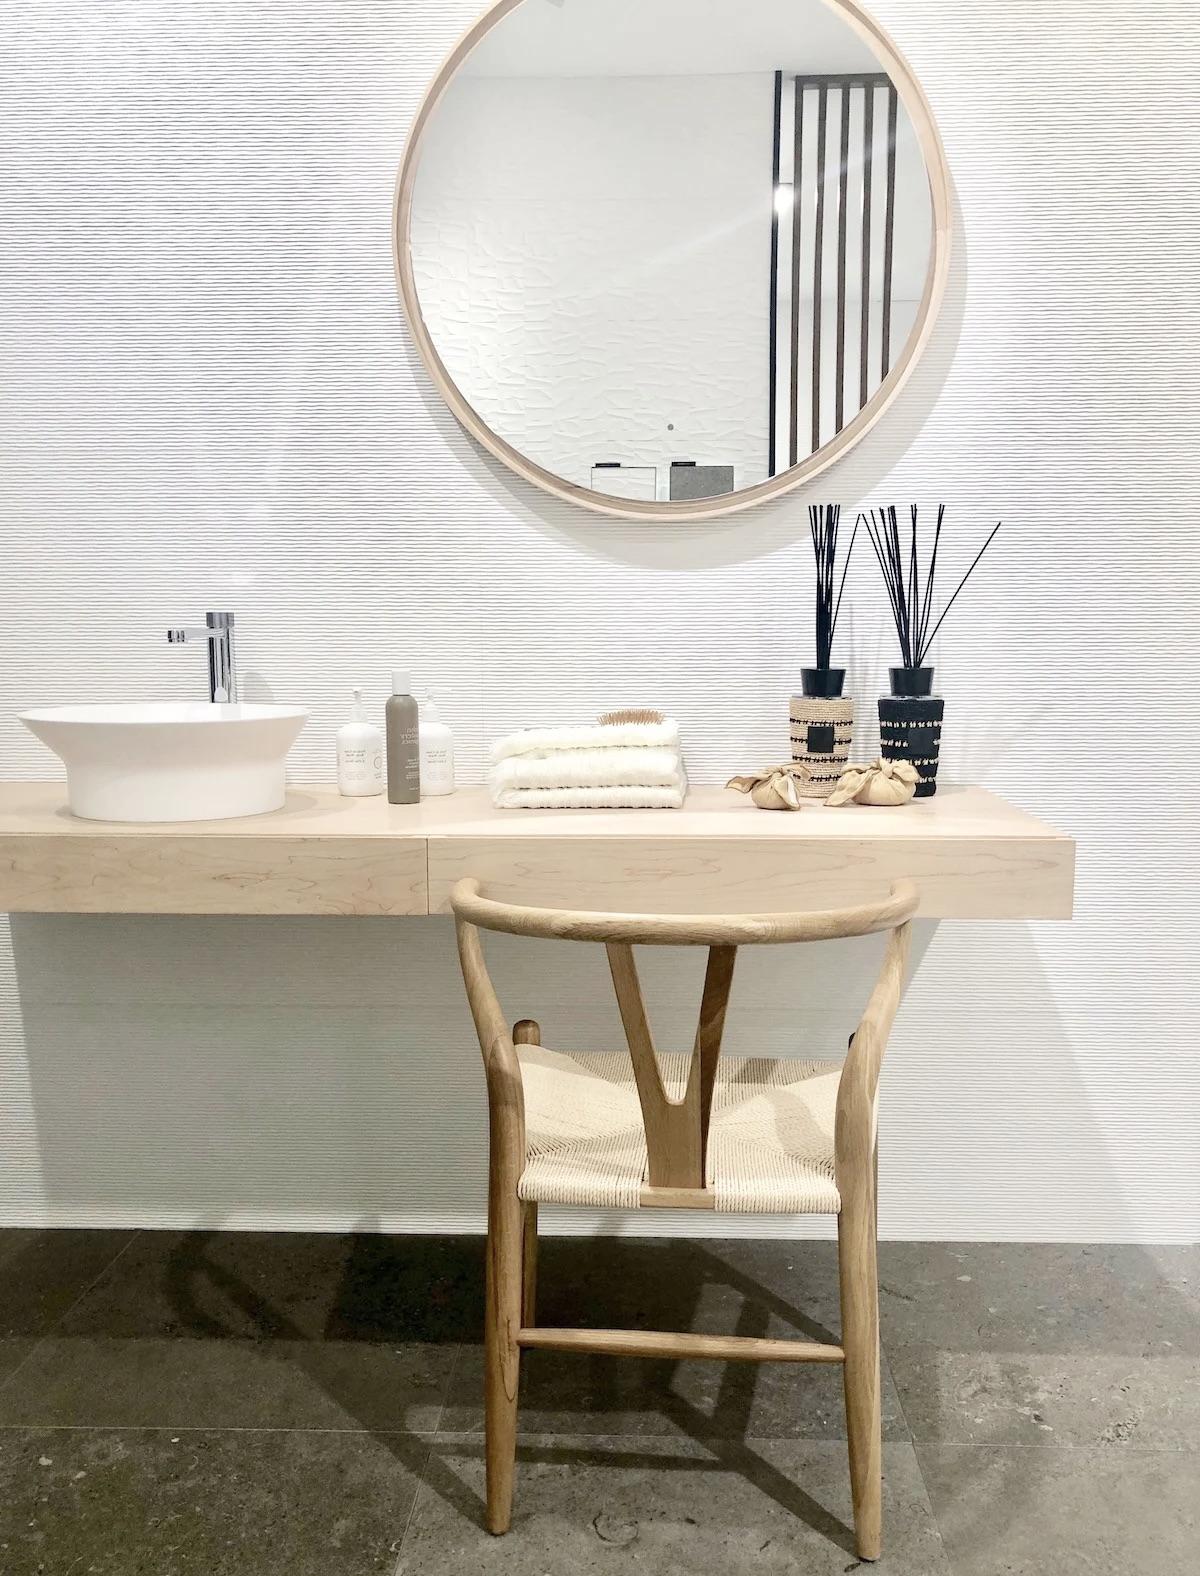 choisir éclairage salle de bain miroir robinet